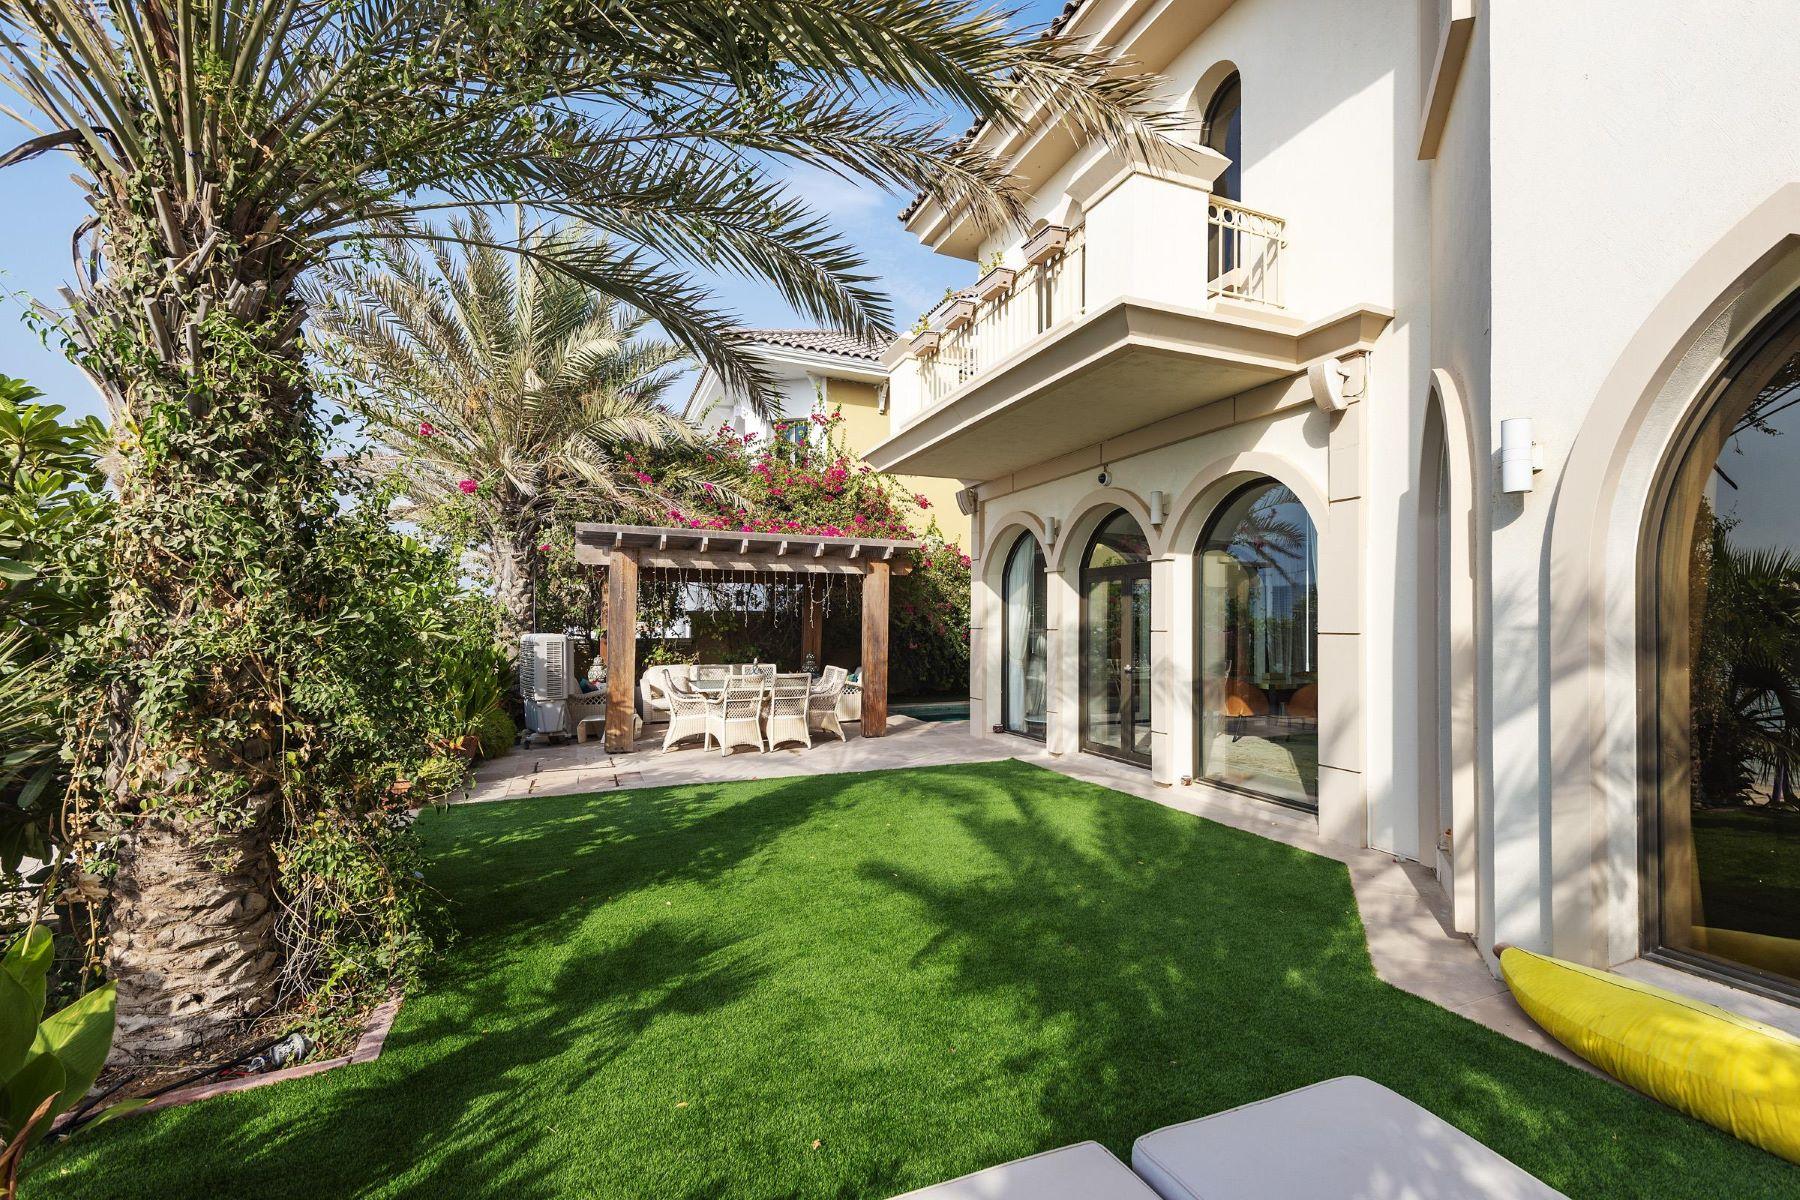 Property for Sale at 5 Bed Mediterranean with Atlantis view. Dubai, Dubai United Arab Emirates